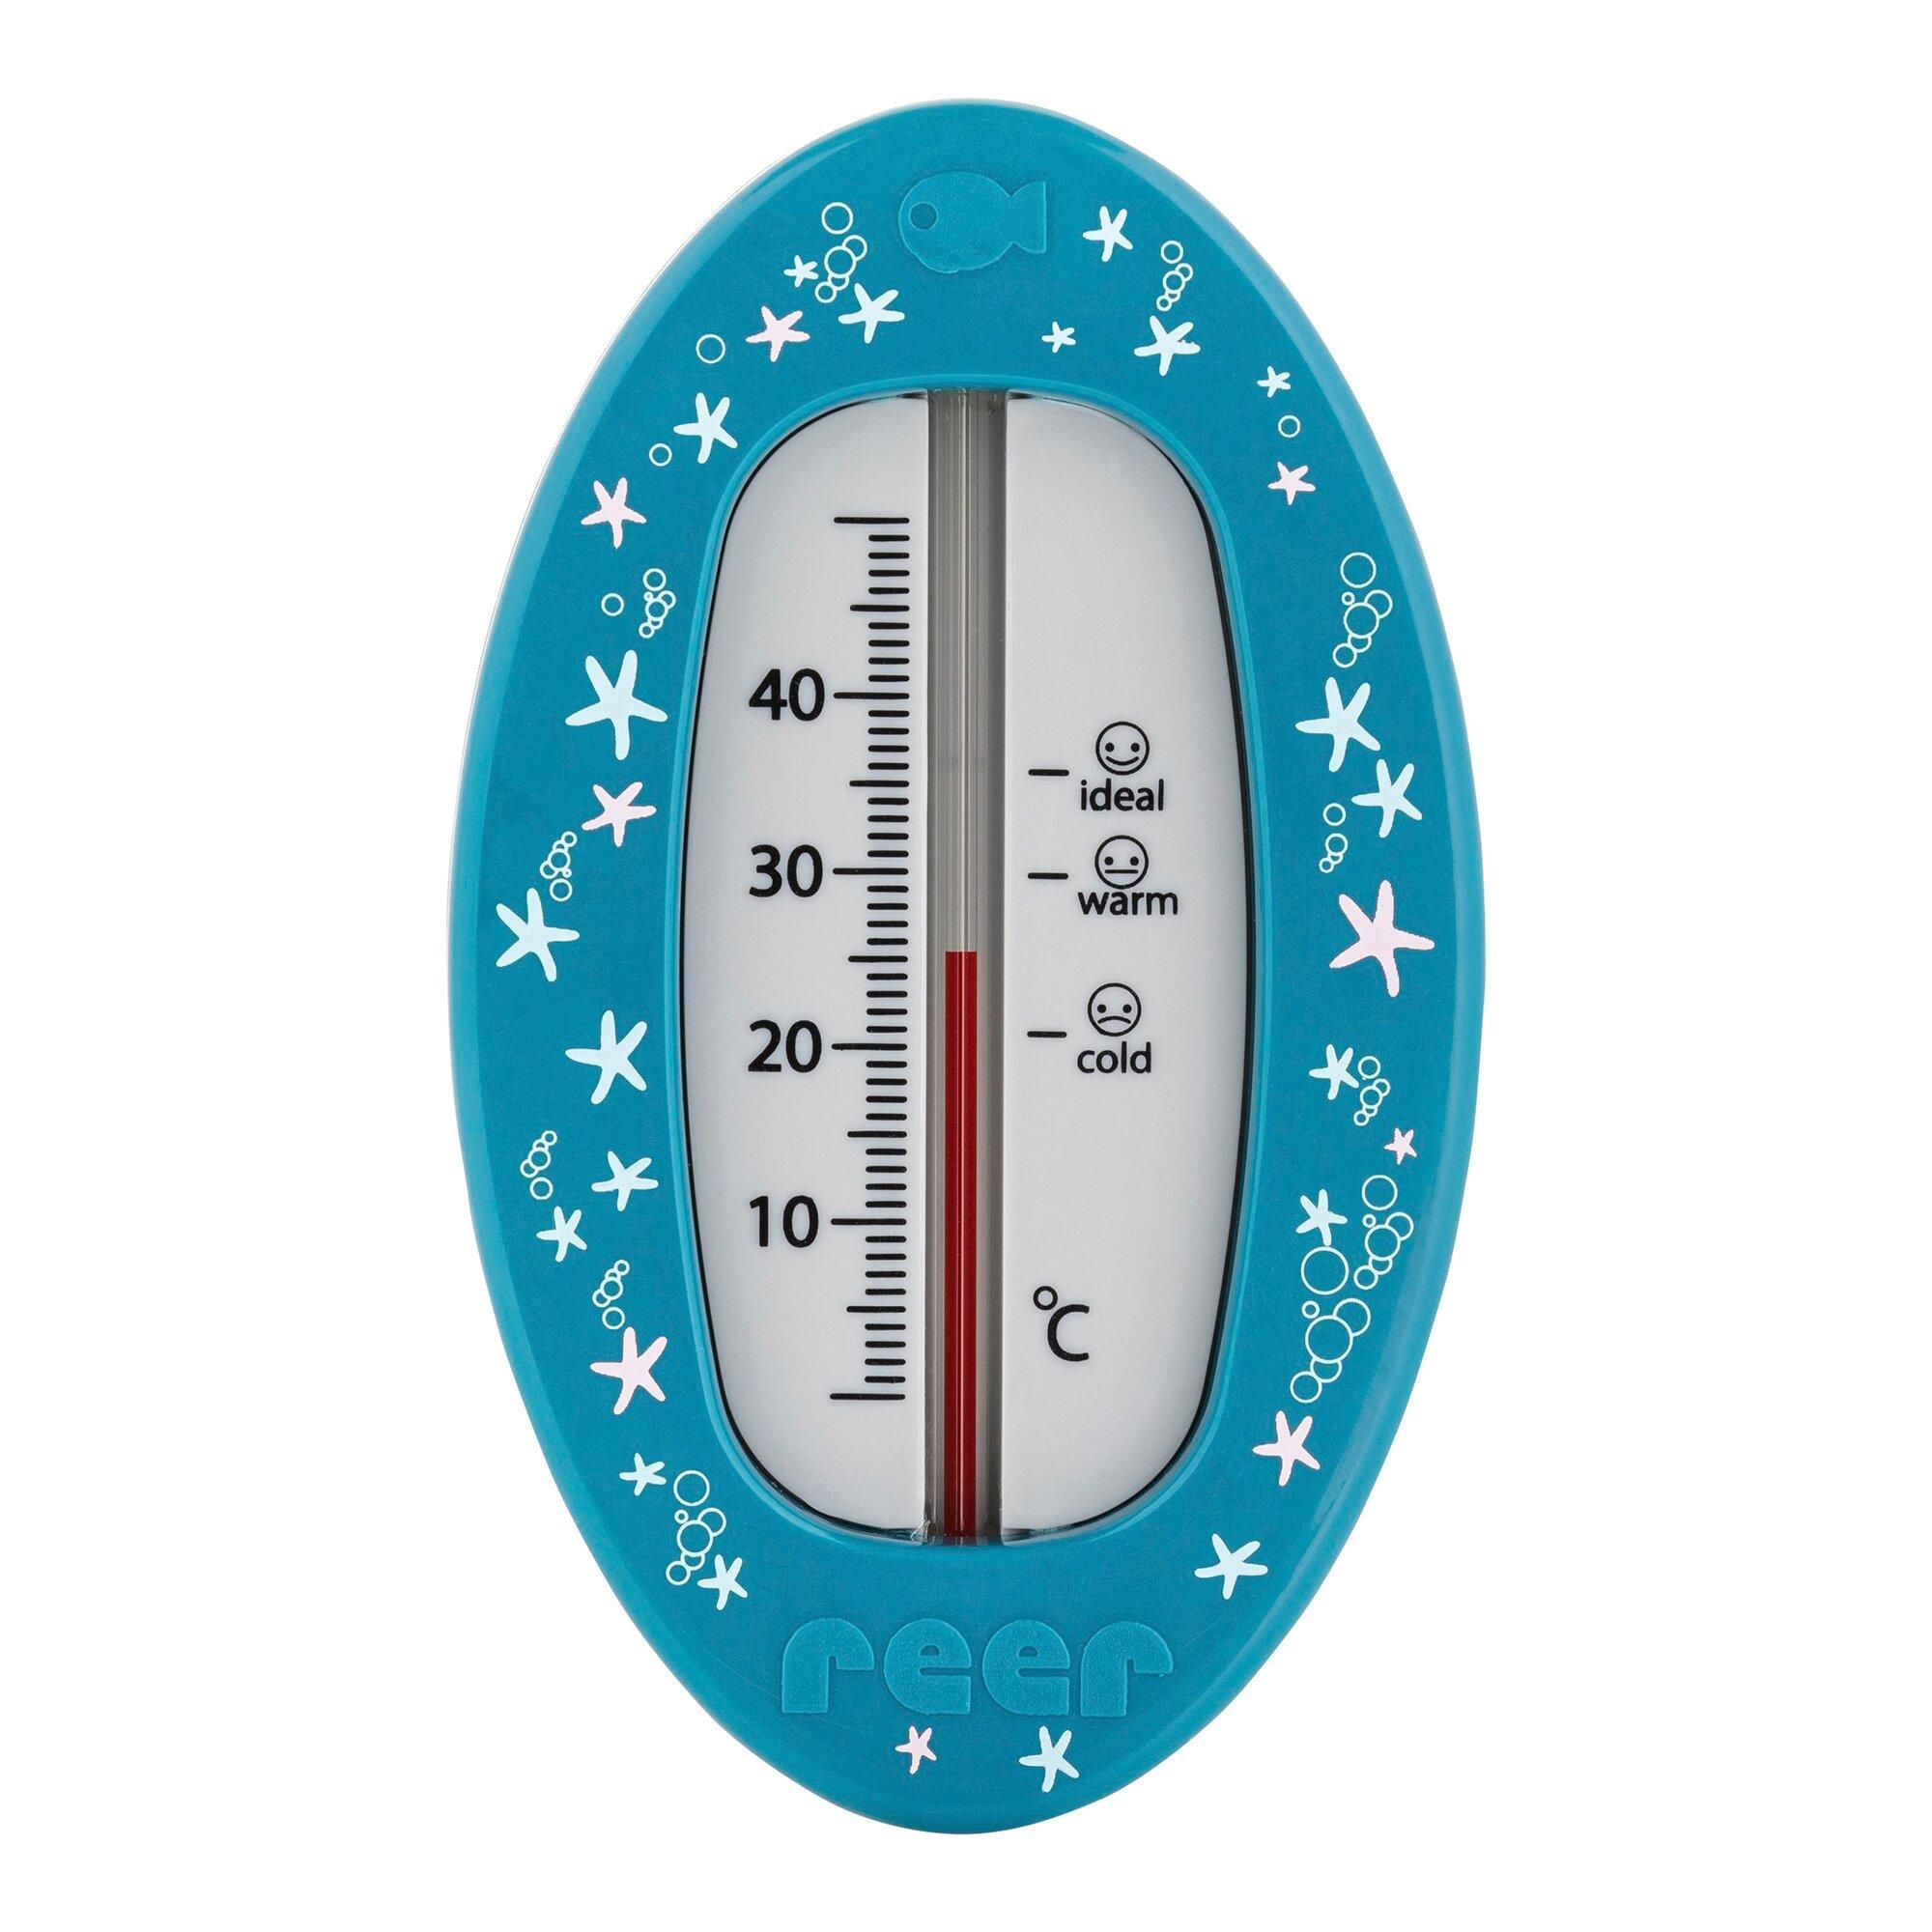 Badethermometer oval